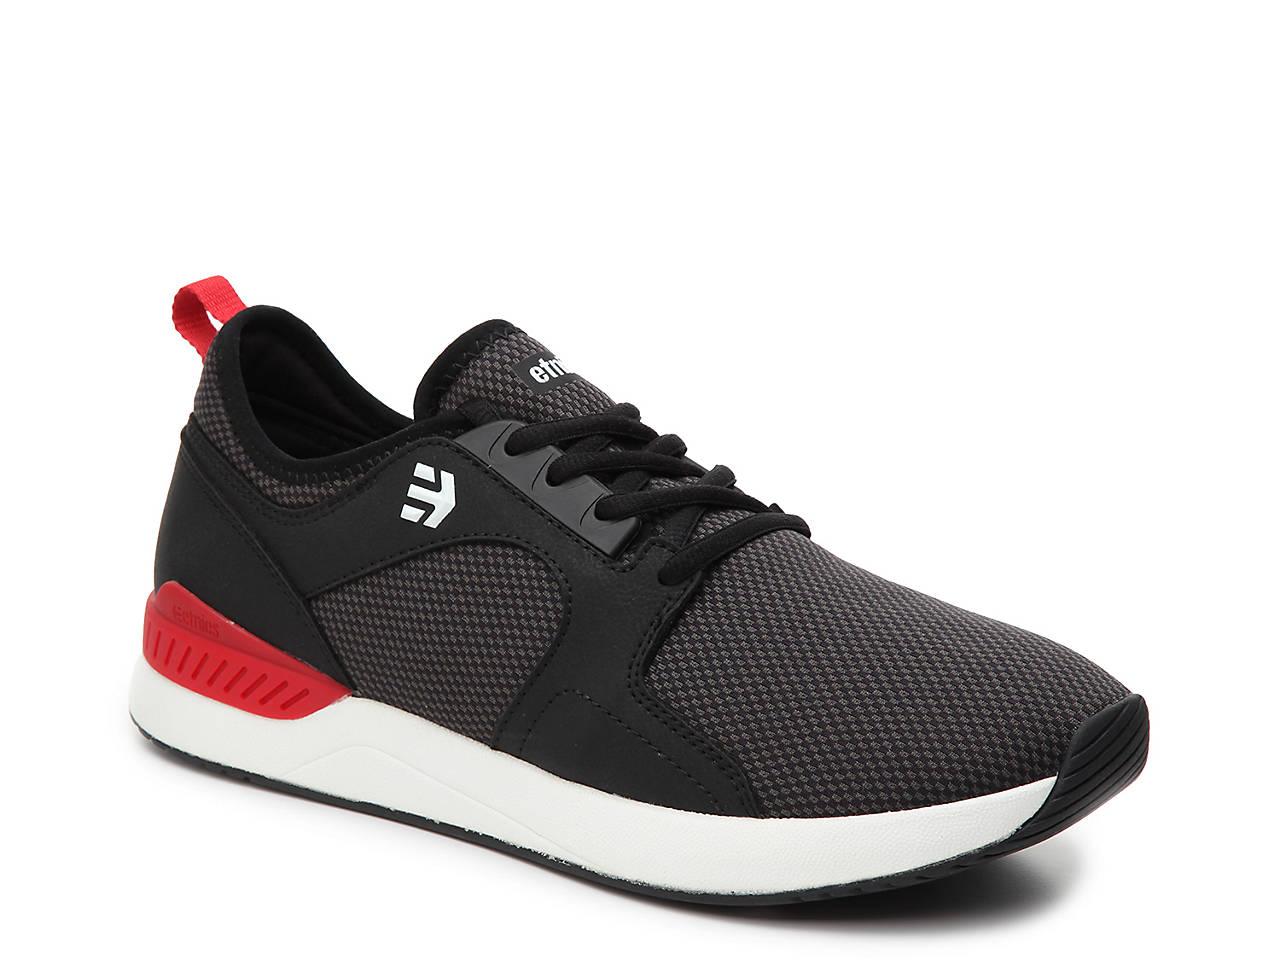 53b087dc6 etnies Cyprus SC Sneaker - Men s Men s Shoes